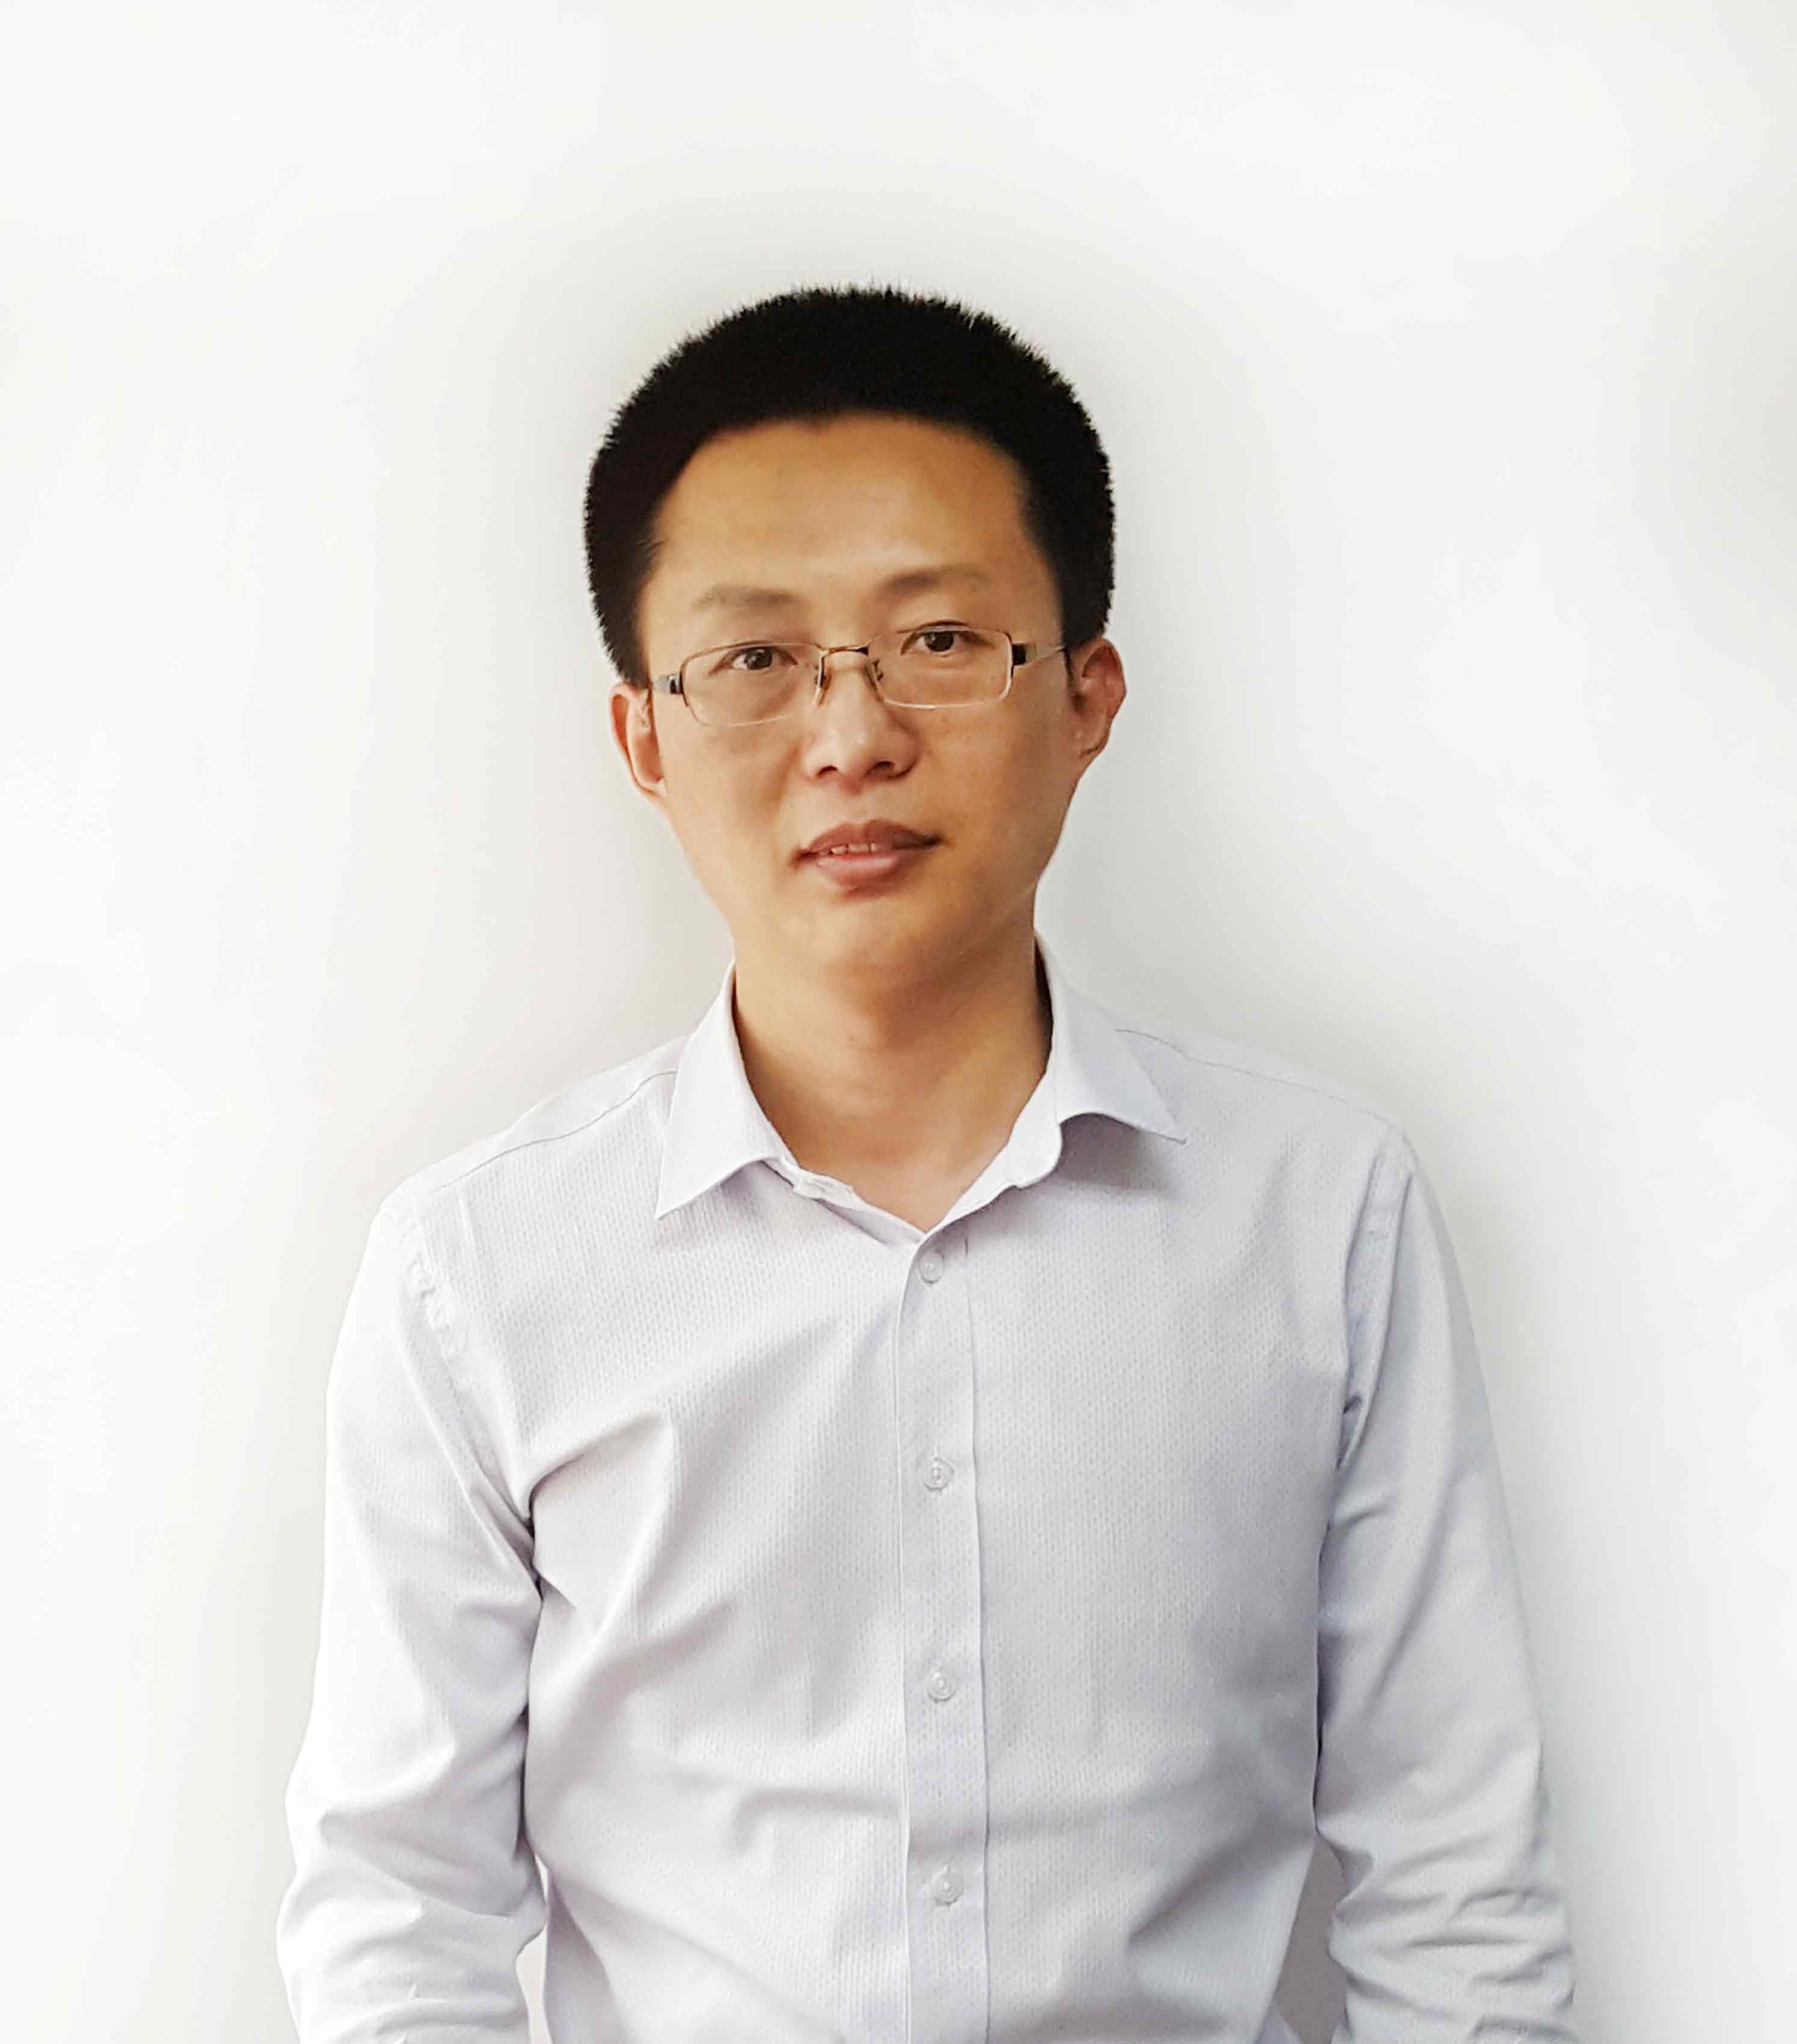 Mr.Xin Minghui